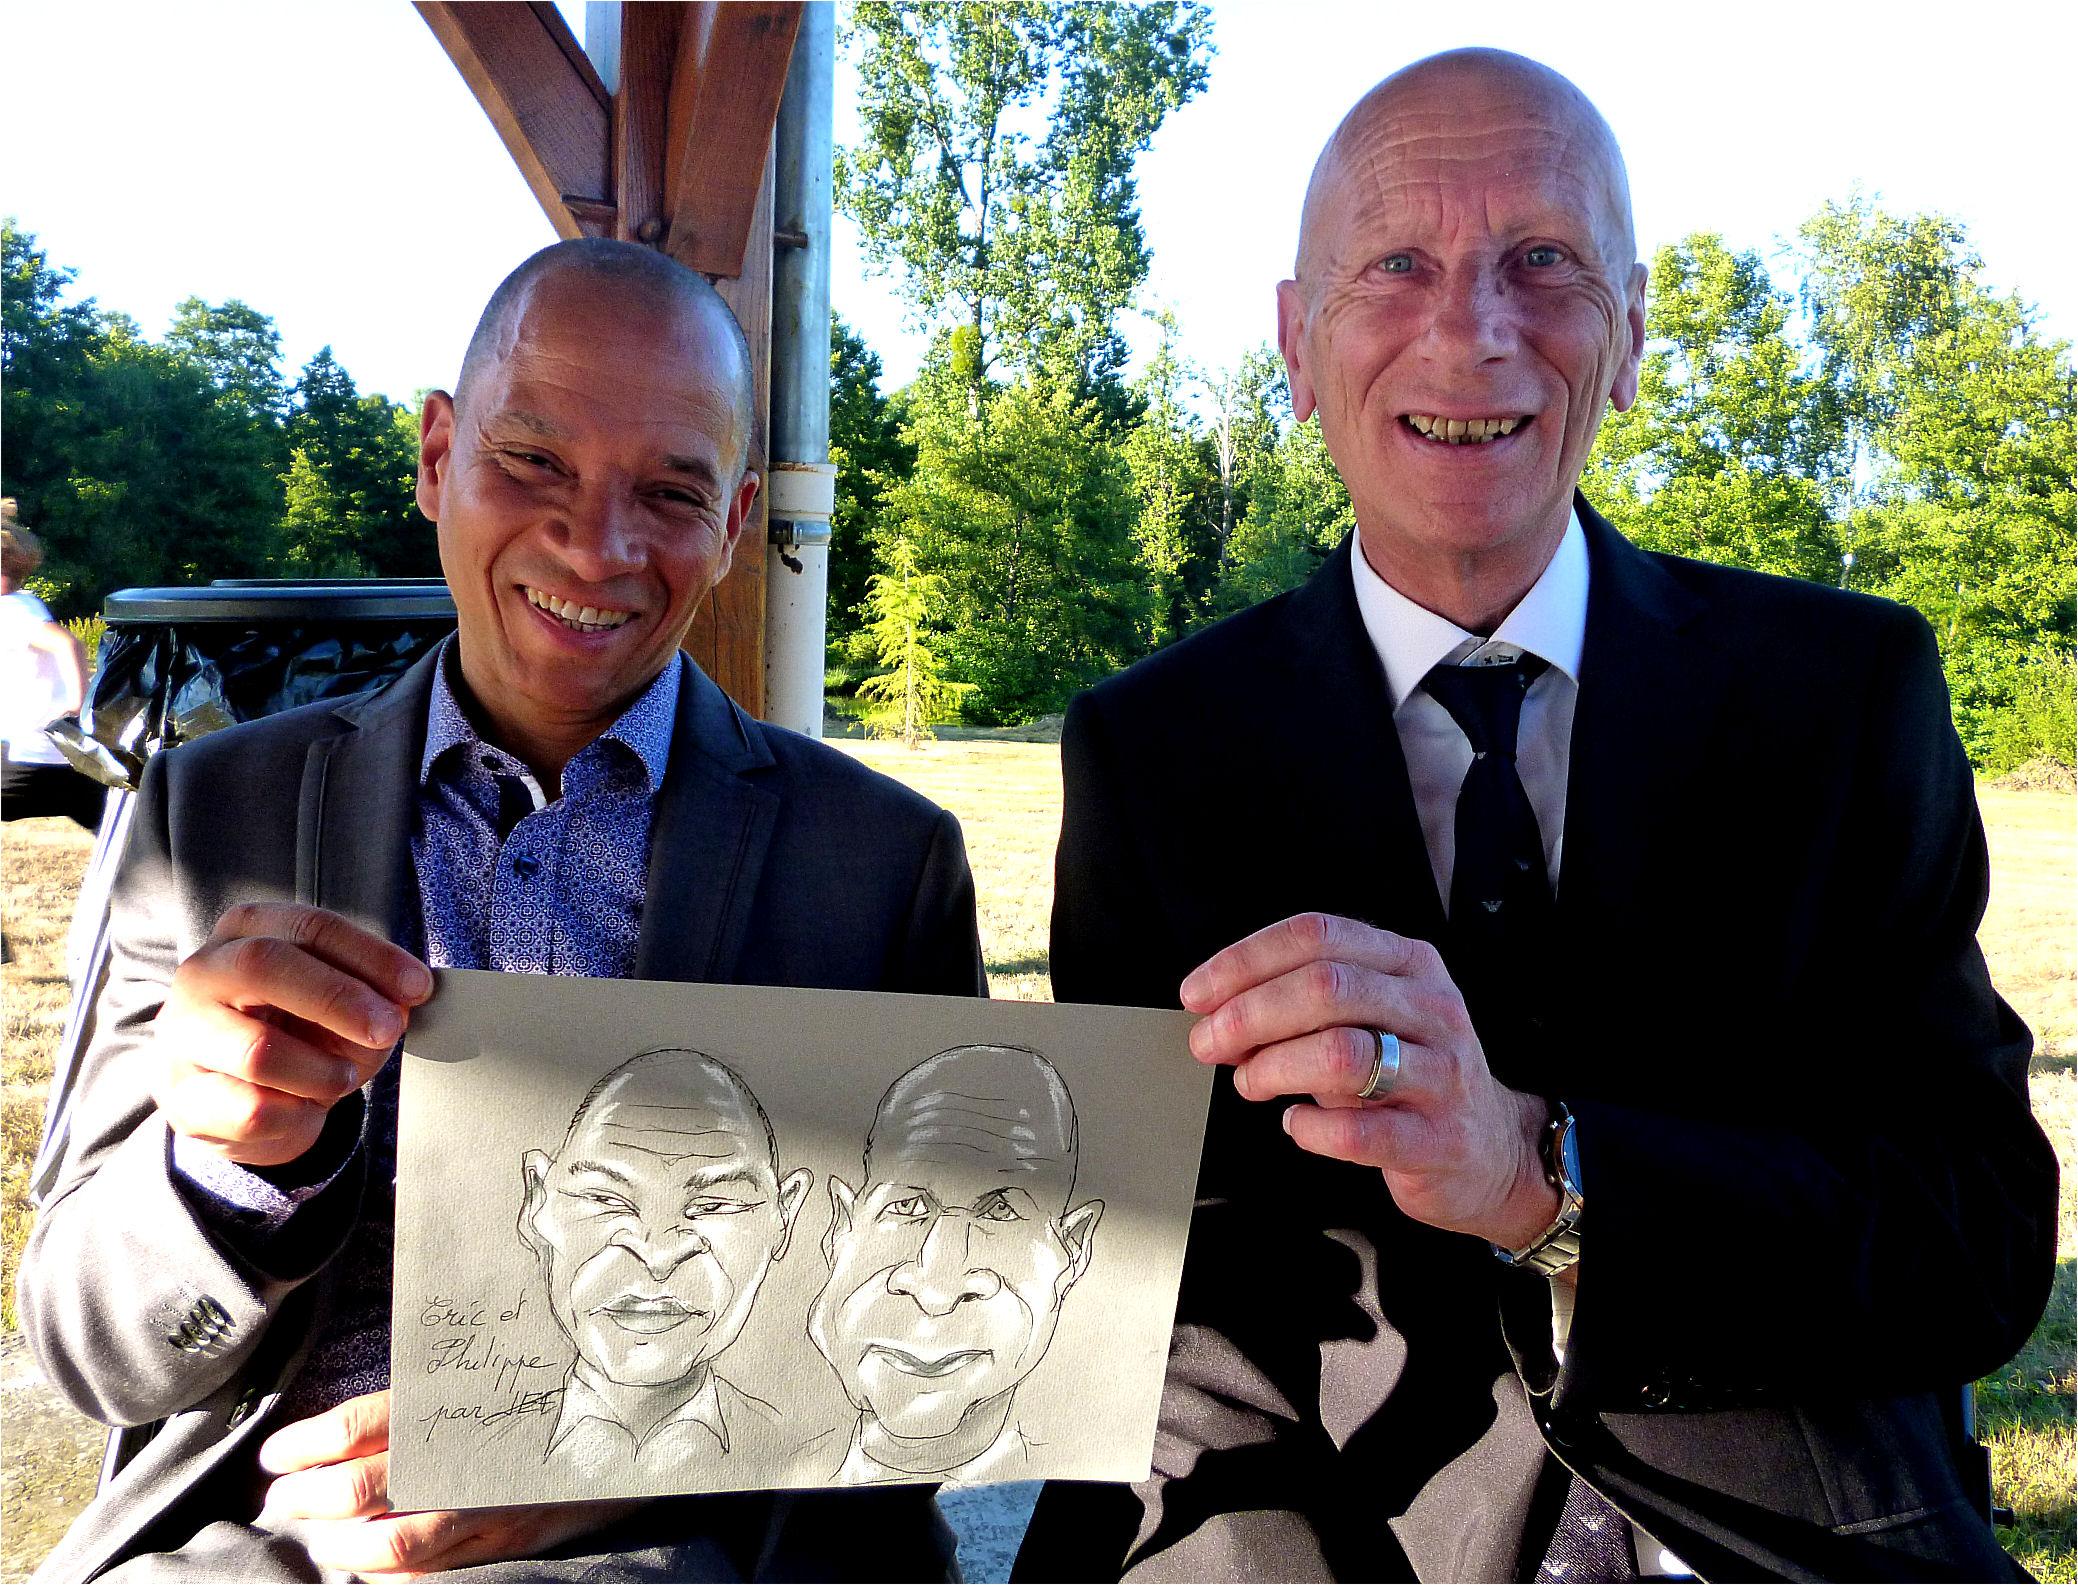 Eric et Philippe caricature de JEF